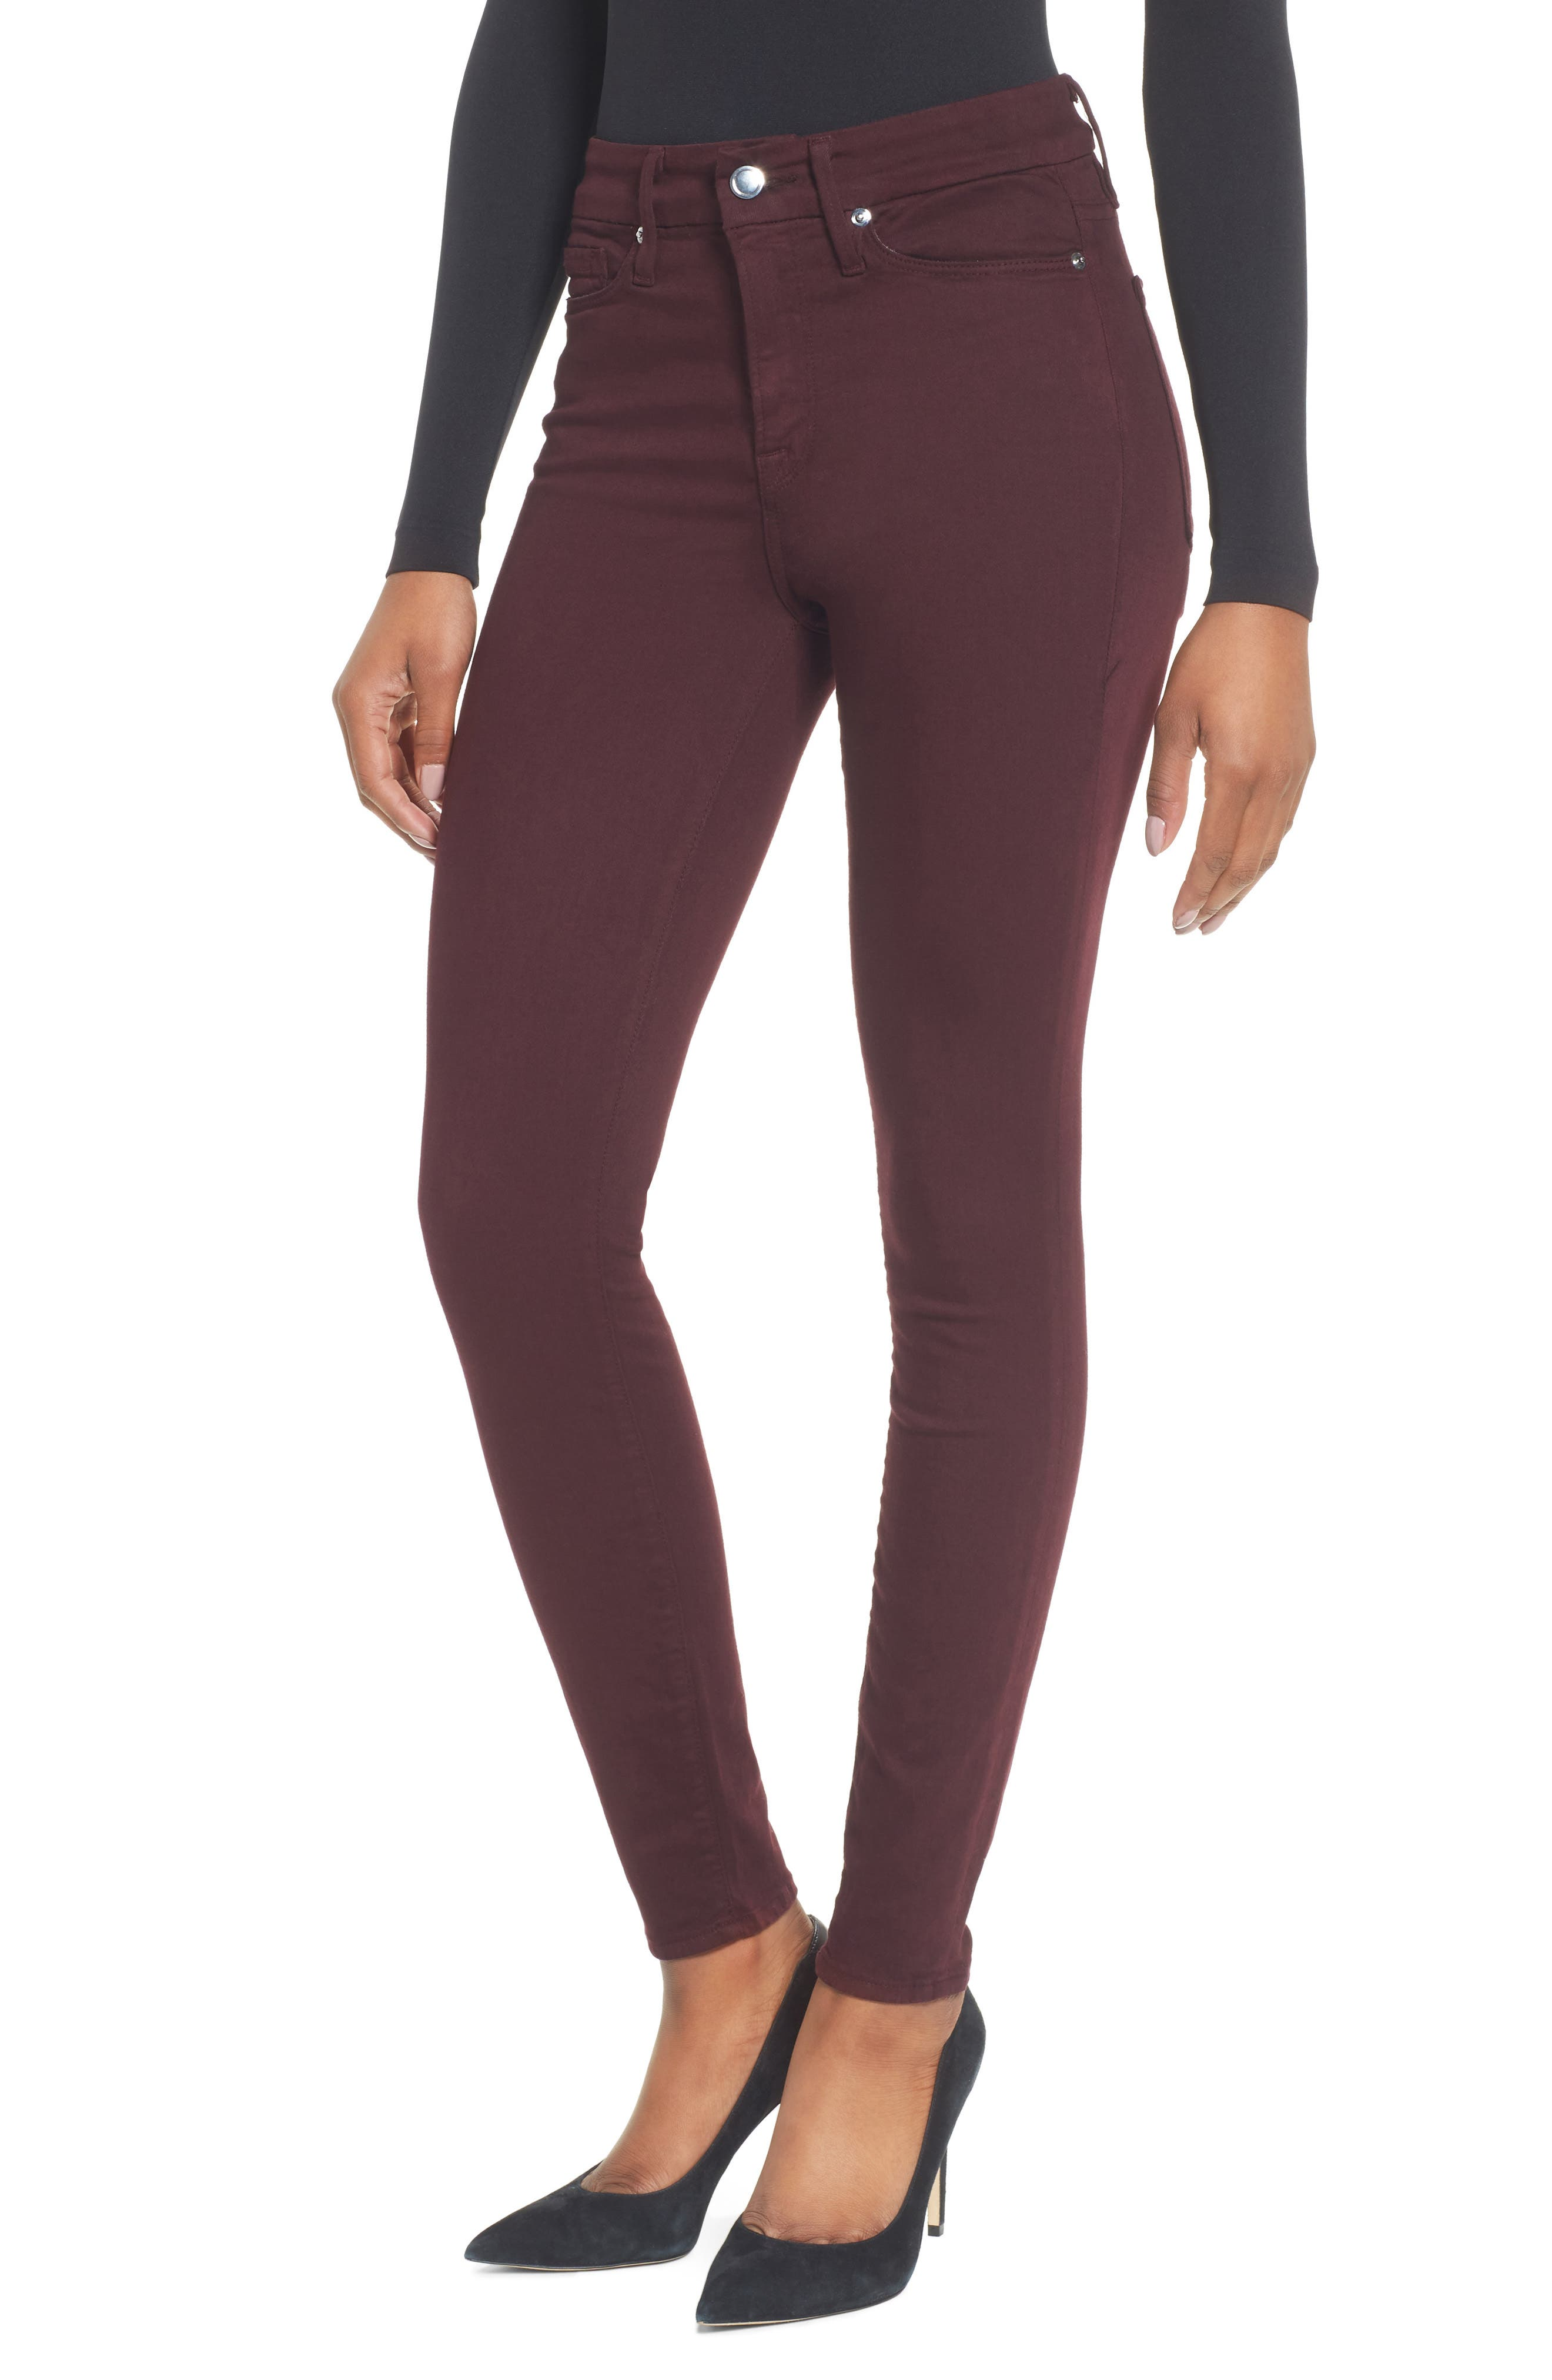 Alternate Image 1 Selected - Good American Good Legs High Waist Skinny Jeans (Burgundy 001) (Regular & Plus Size)